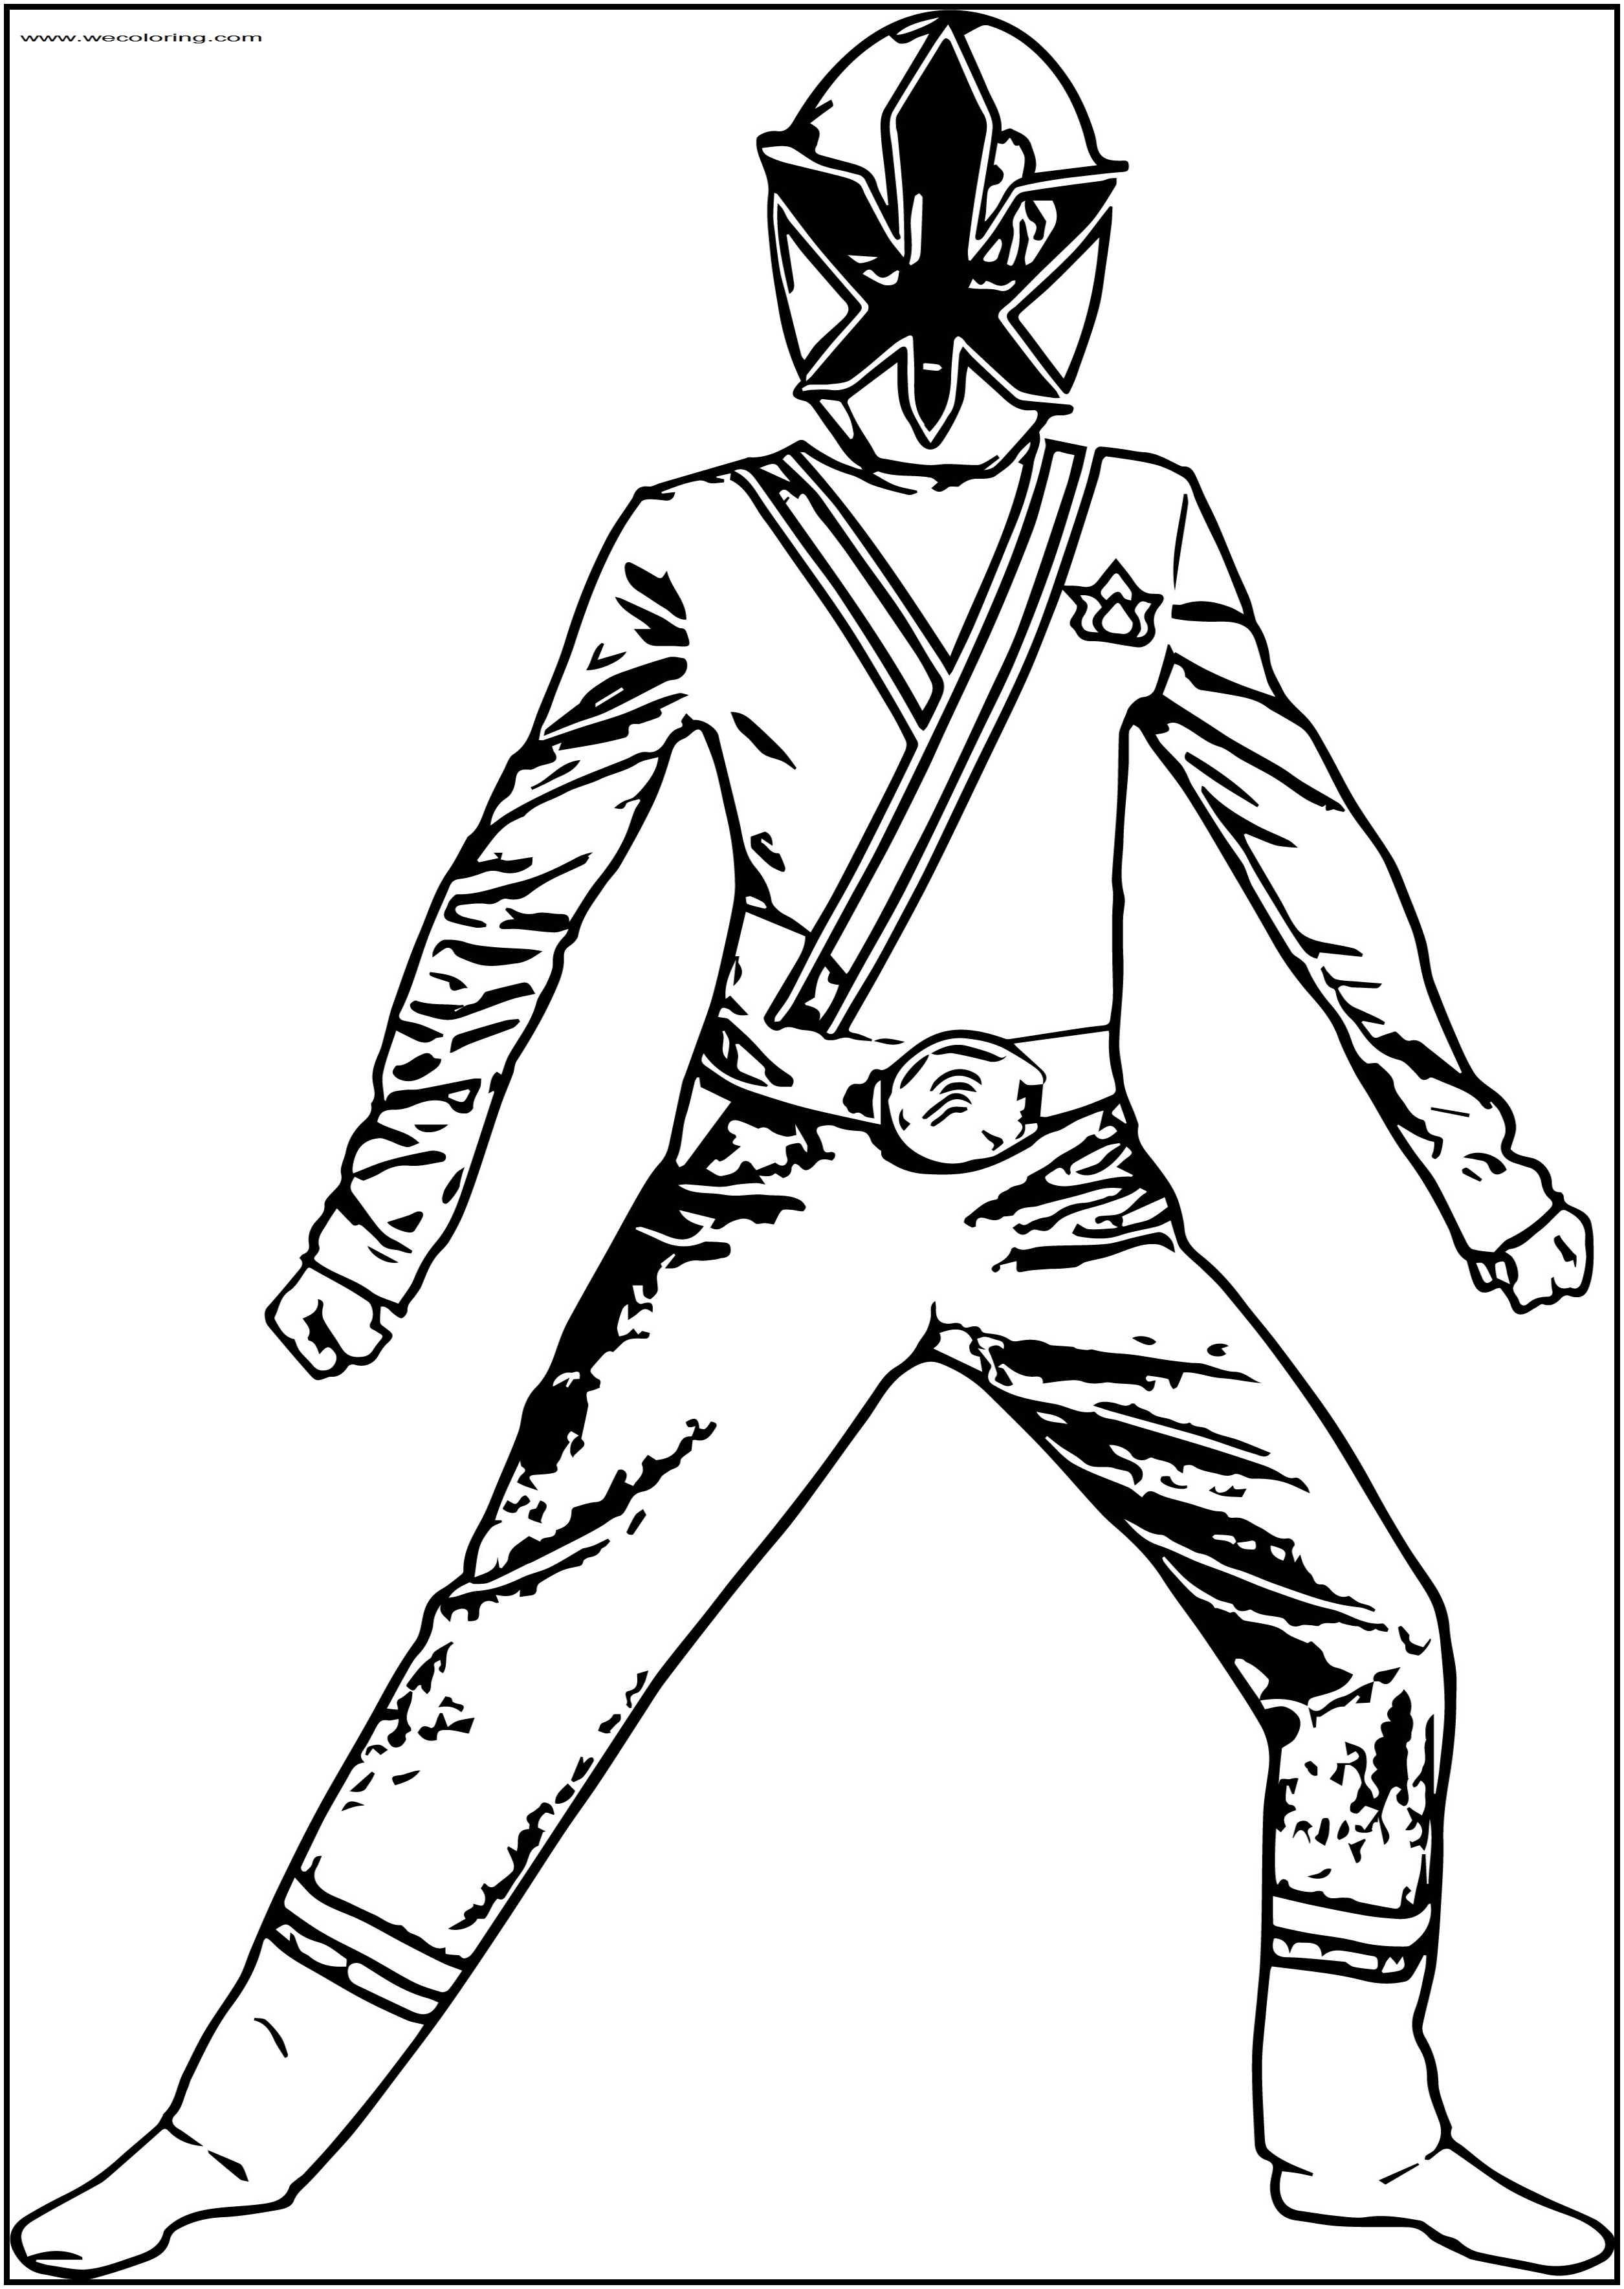 Waiting Ninja Power Rangers Free Printable Coloring Page